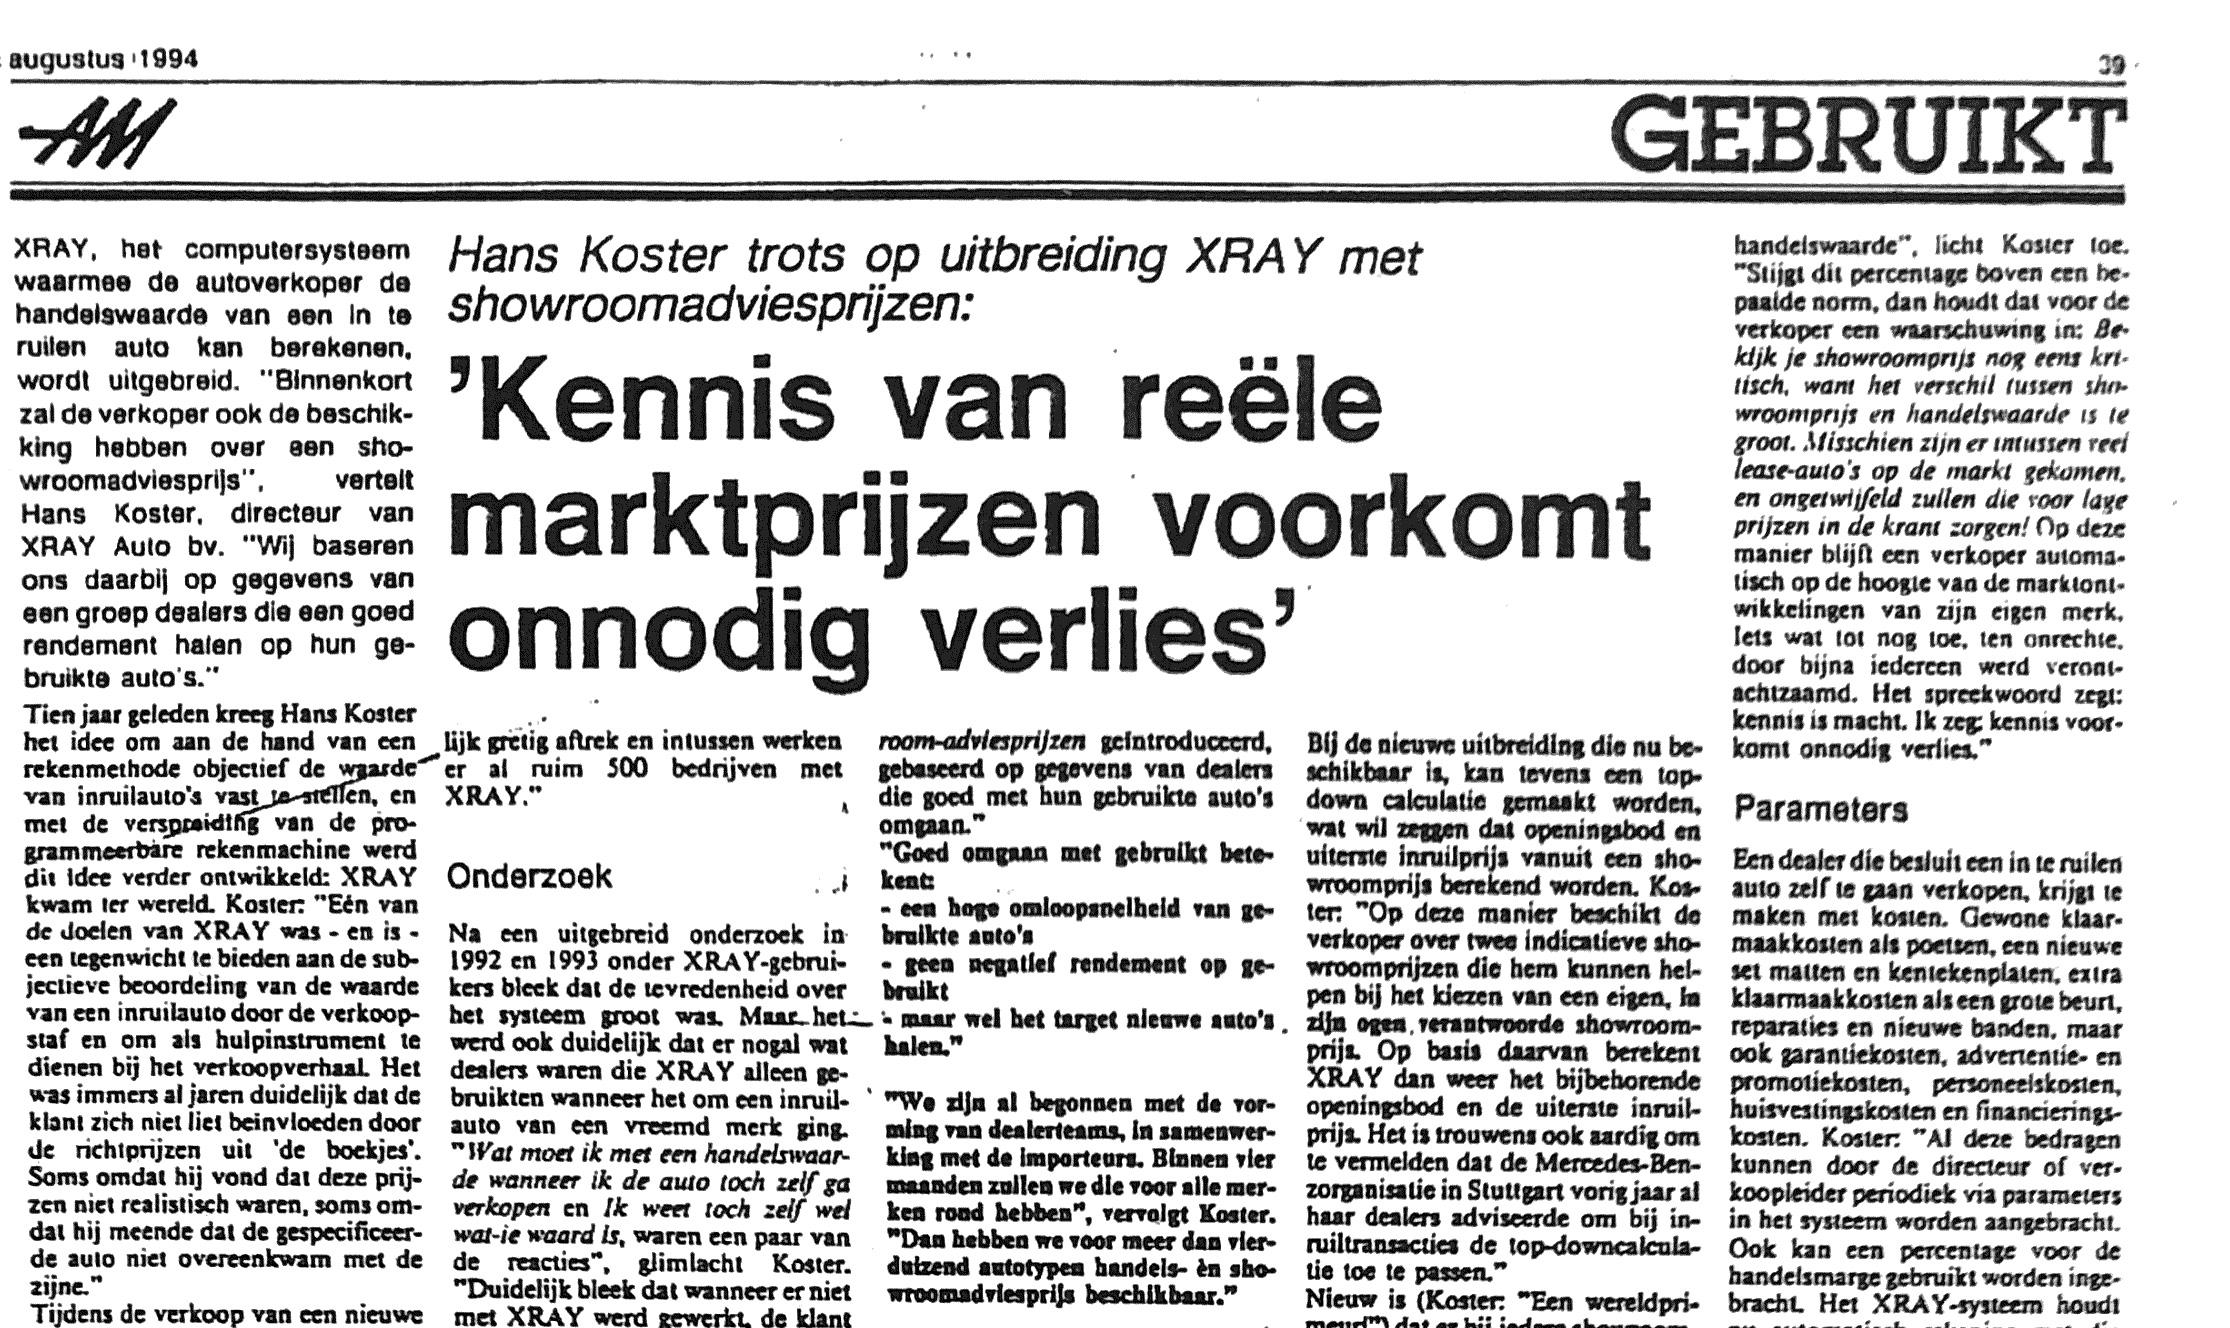 artikel-uit-1994-intro